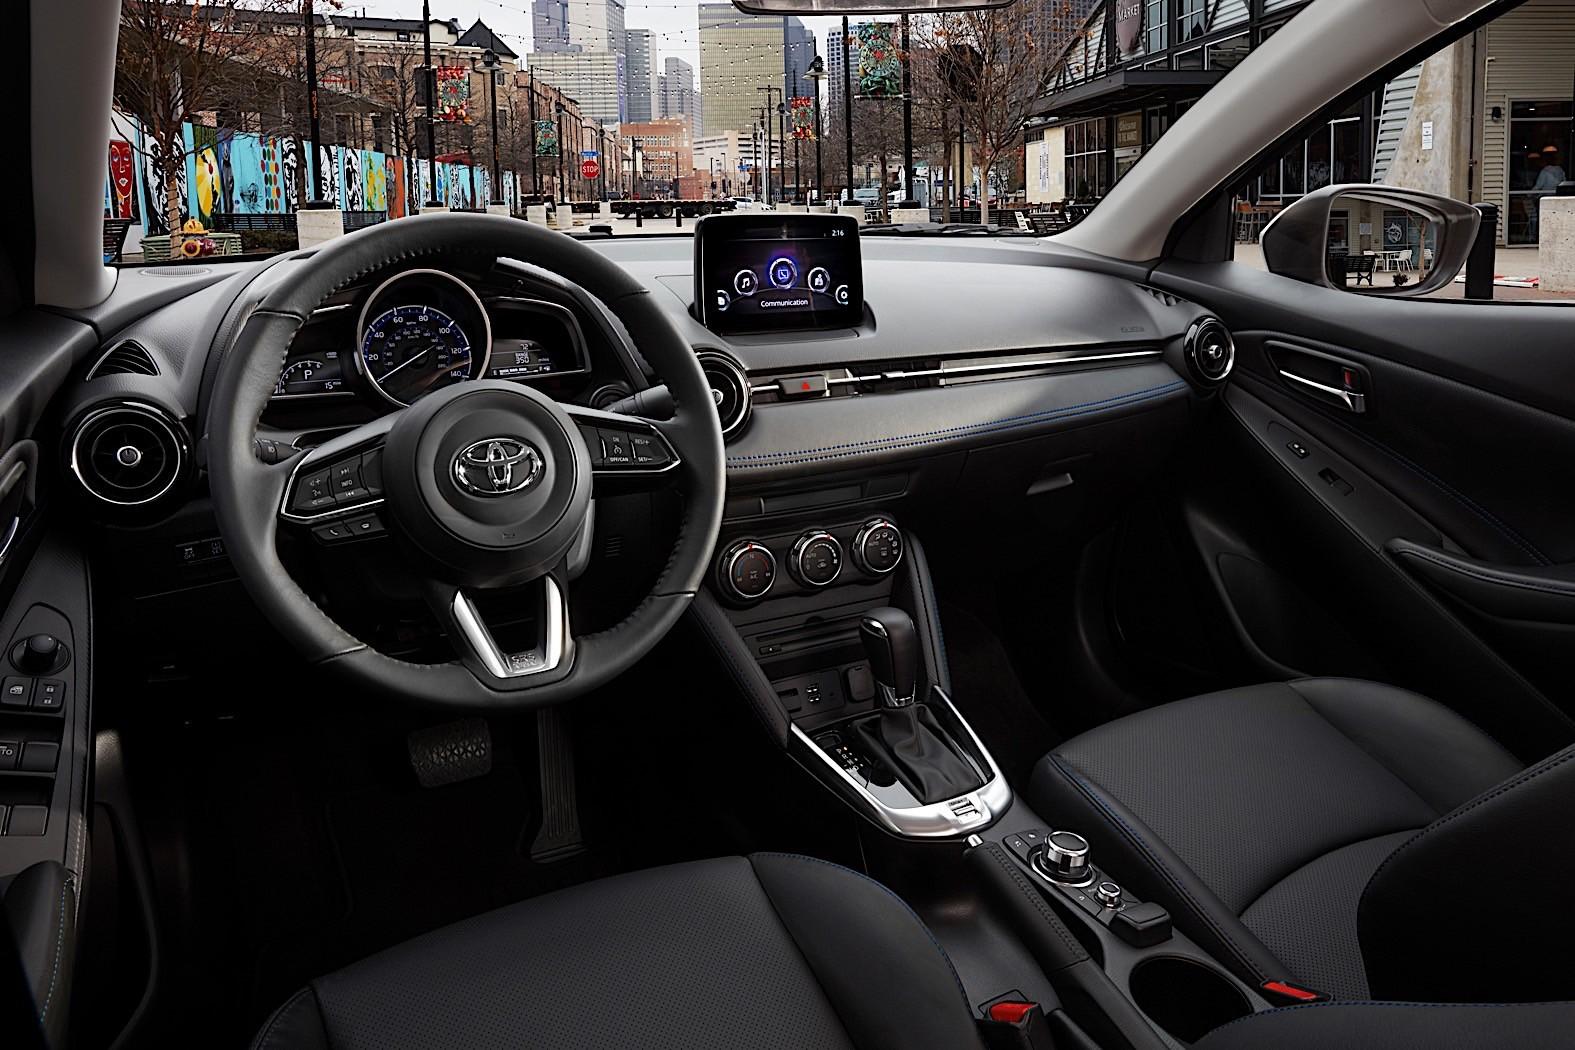 Toyota Yaris iA Becomes Yaris Sedan for 2019 Model Year ...